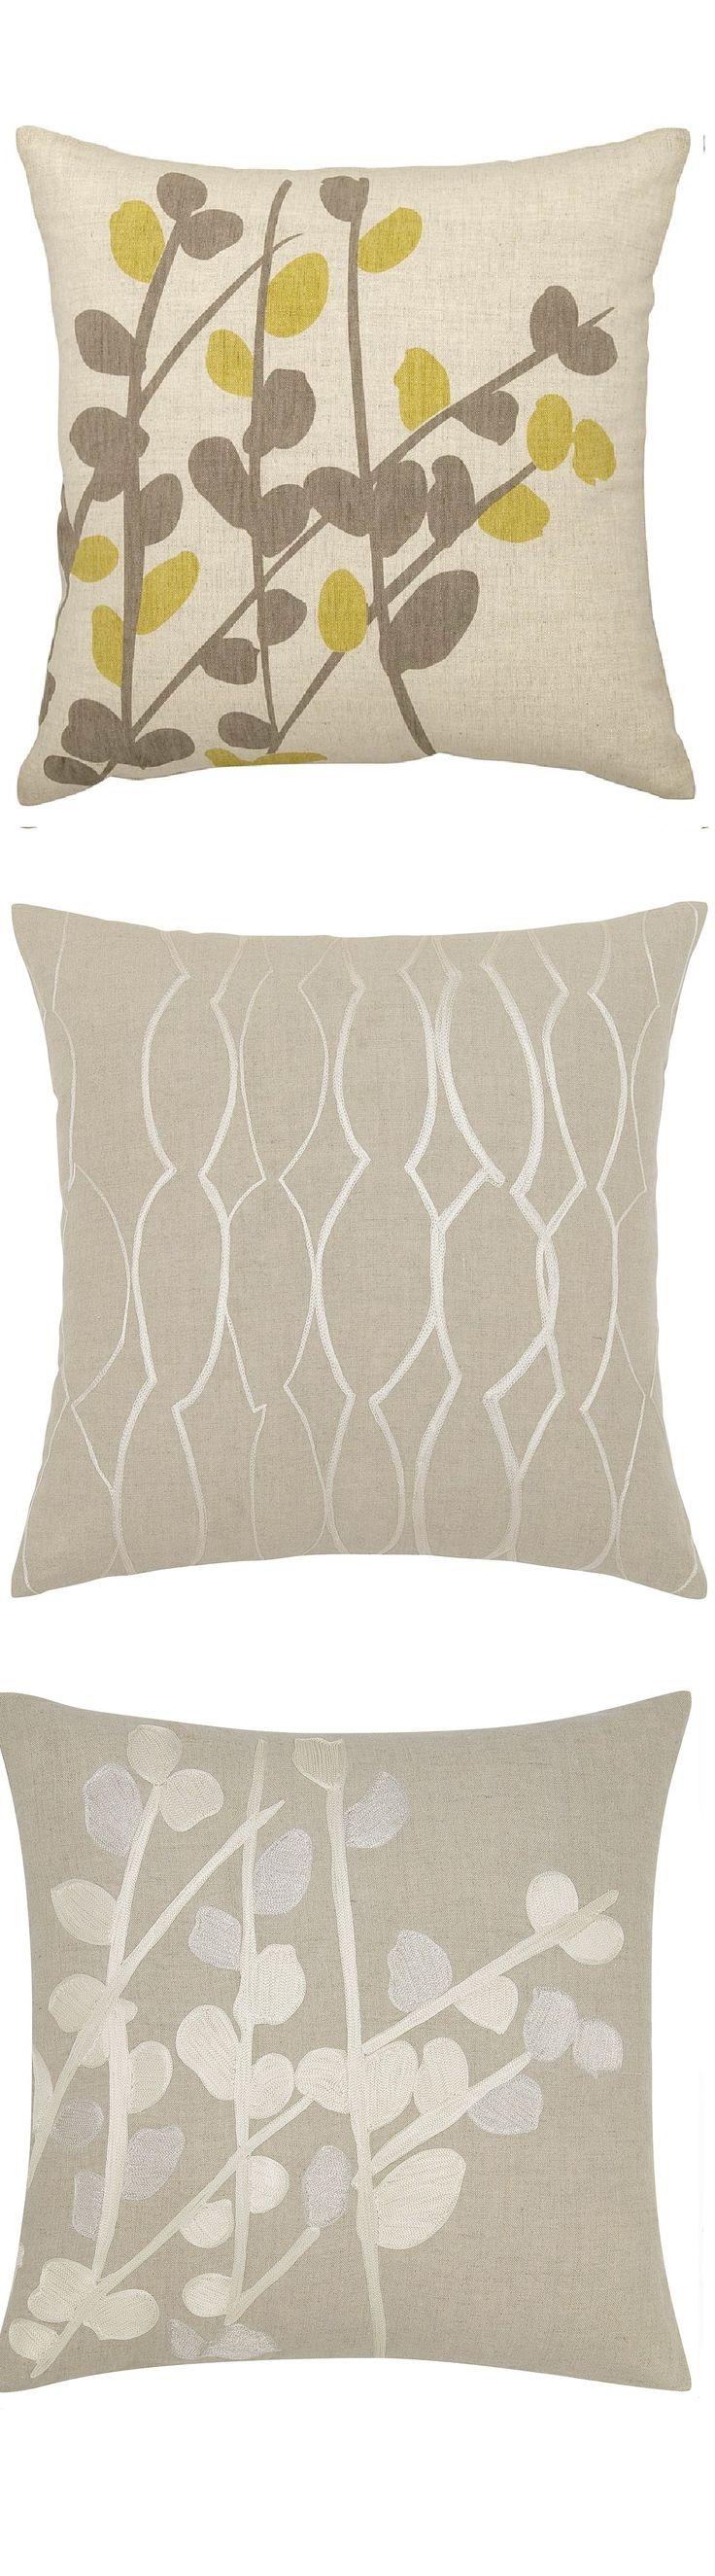 Best 25 Grey pillow cases ideas on Pinterest